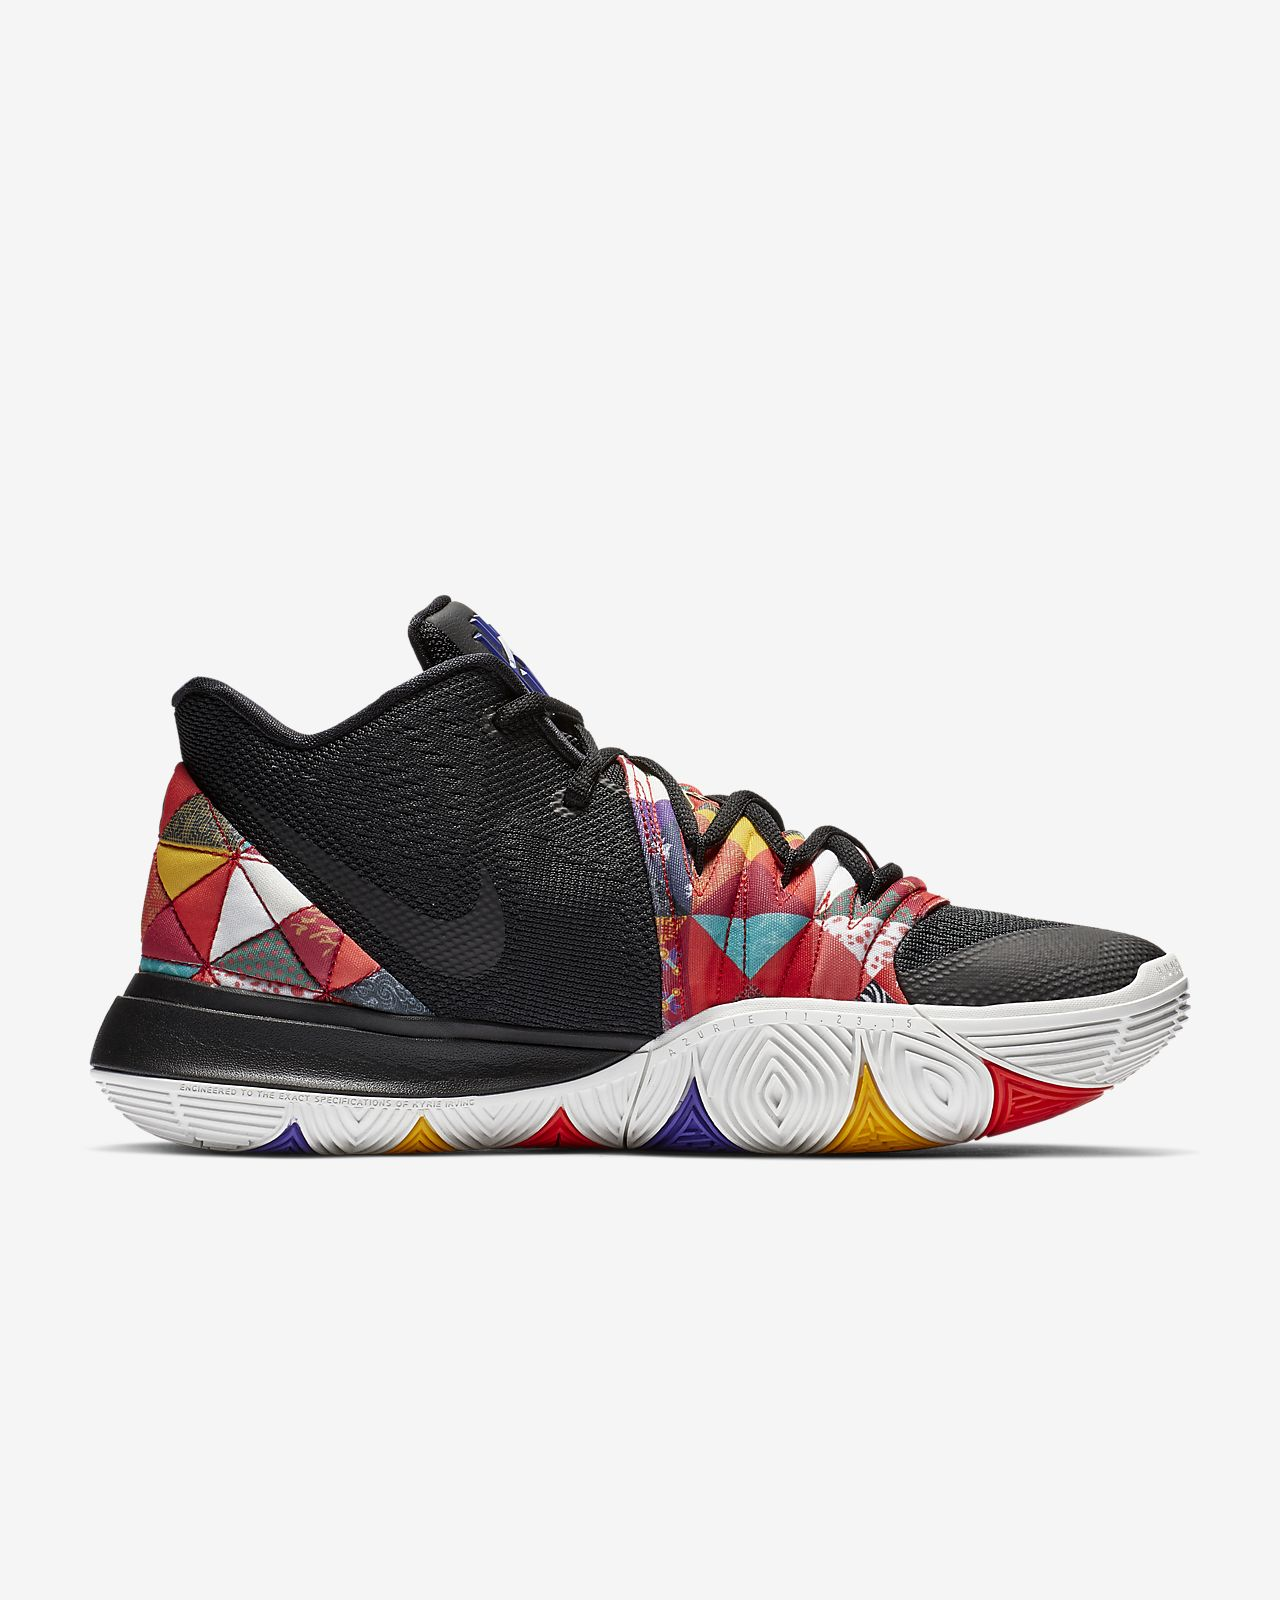 quality design c32aa d40d1 Kyrie 5 CNY Basketball Shoe. Nike.com CH